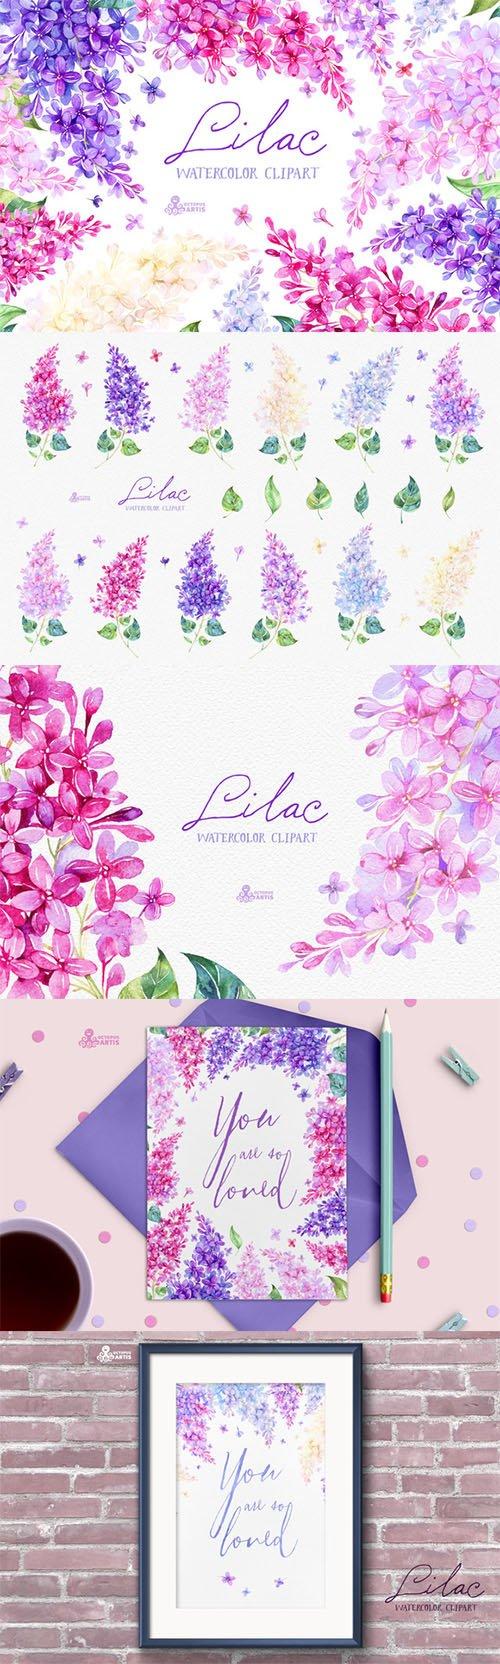 Lilac bathroom accessories